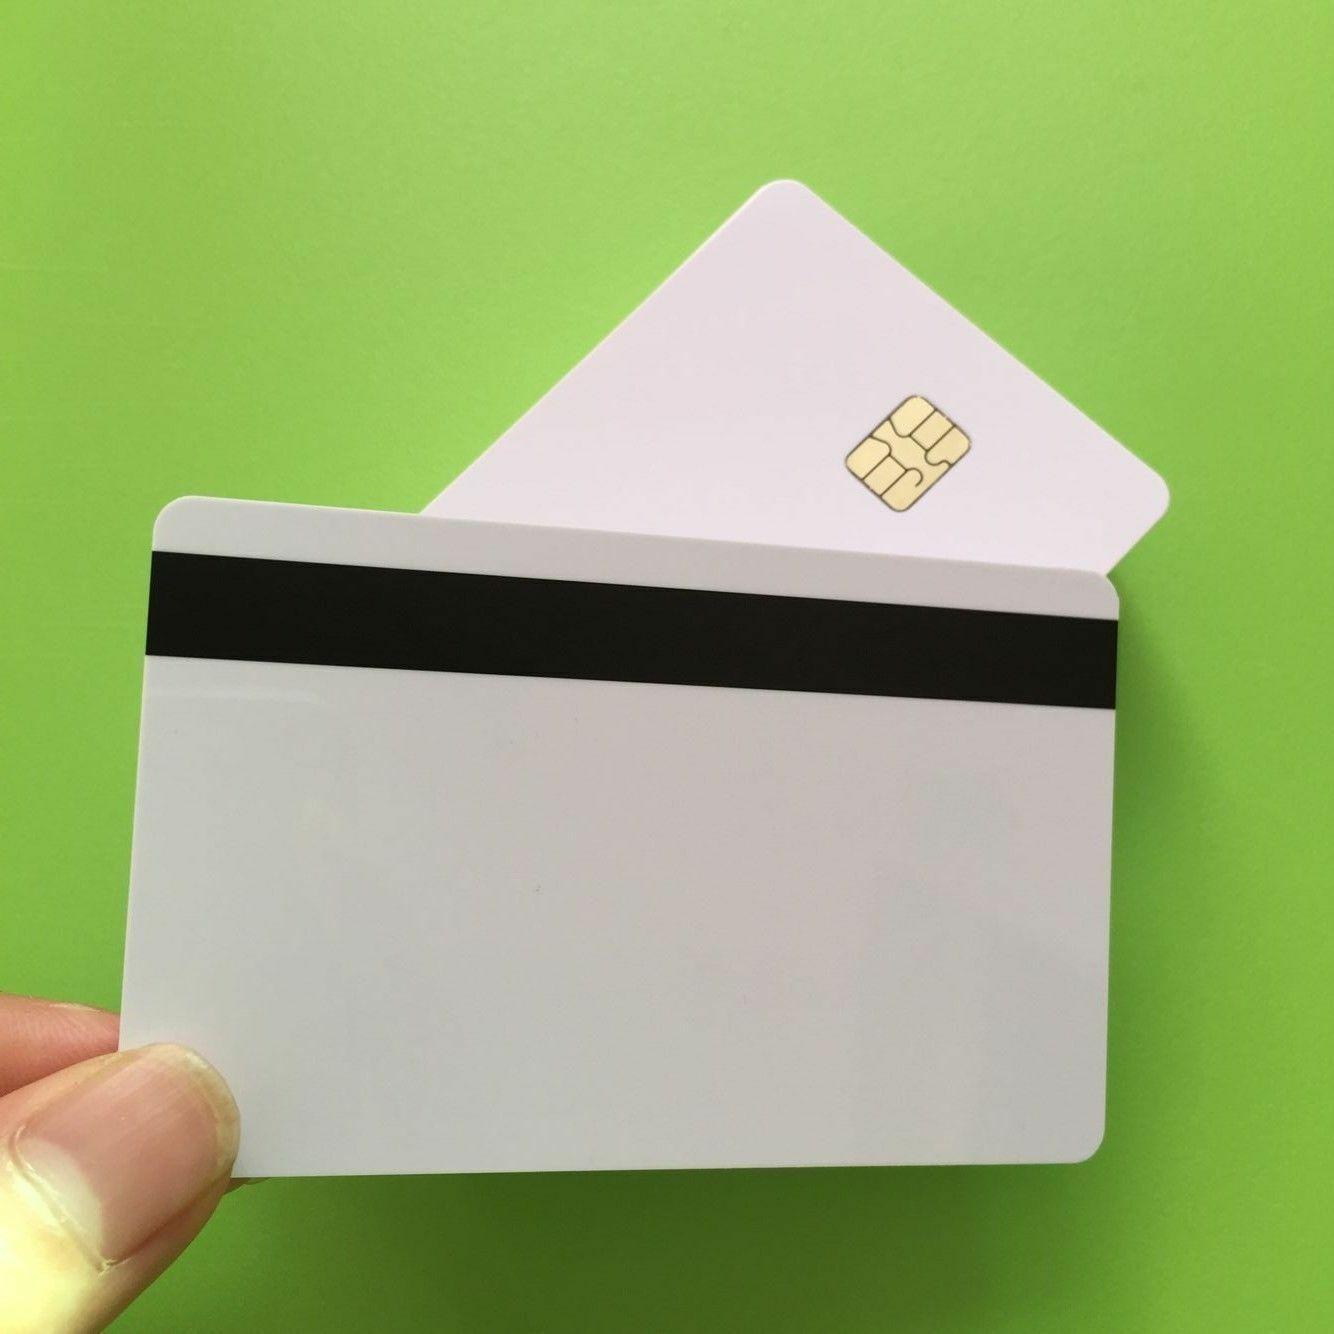 10 * Blank Smart Card Sle4442 Chip+Magnetic Strip Hico 3 track Inkjet PVC